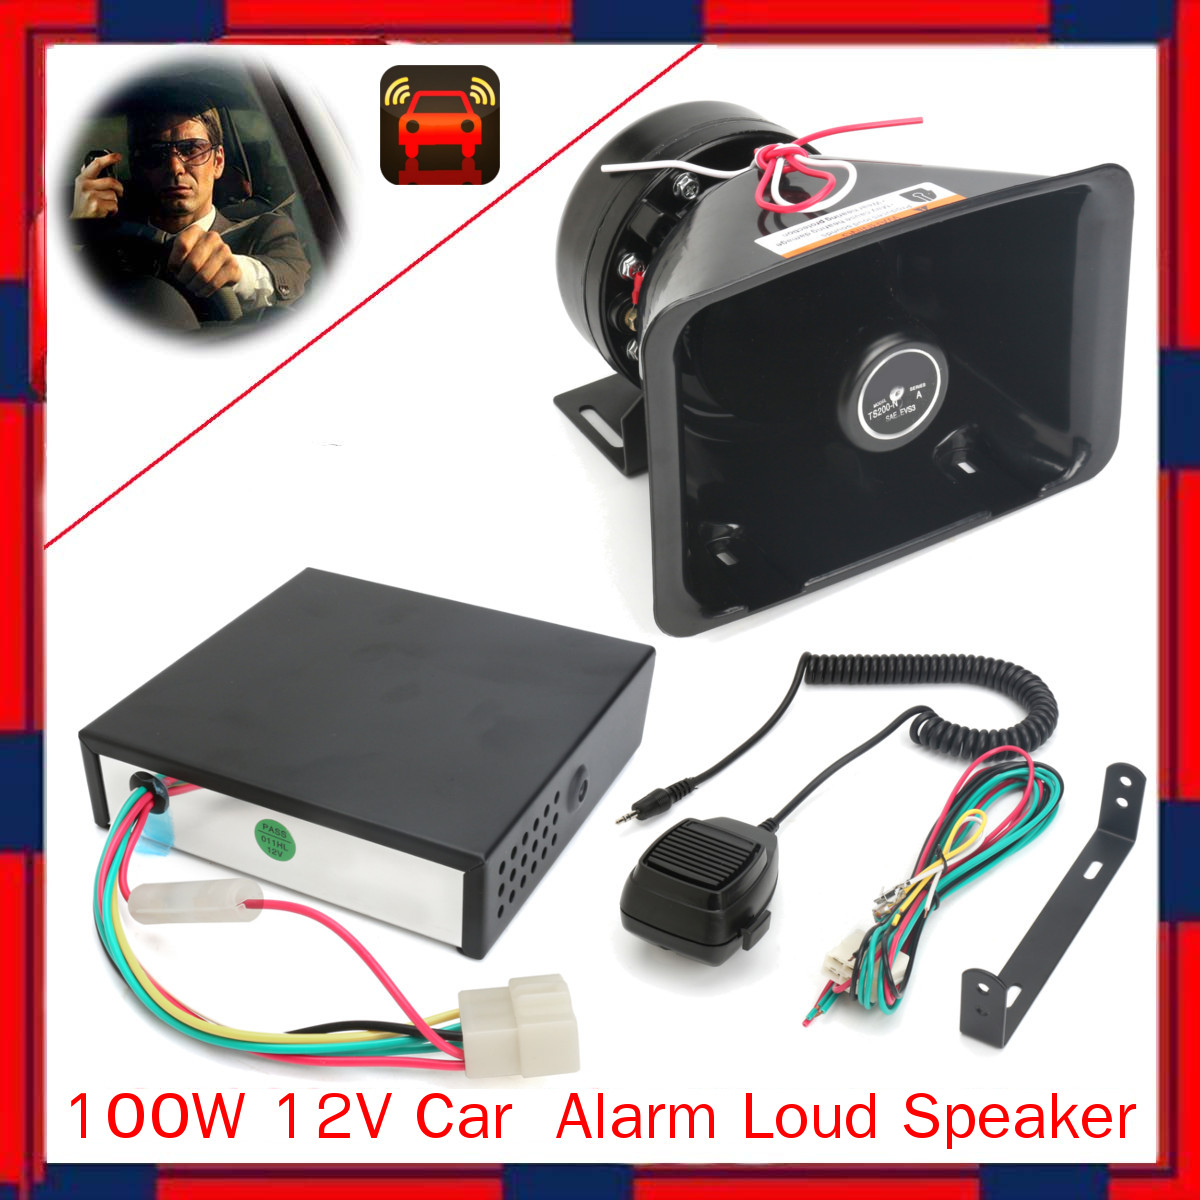 100W 12V Car Truck Alarm Loudspeaker PA Siren Horn Warning Ambulance MIC System Kit Car Truck 135dB 8 Sound